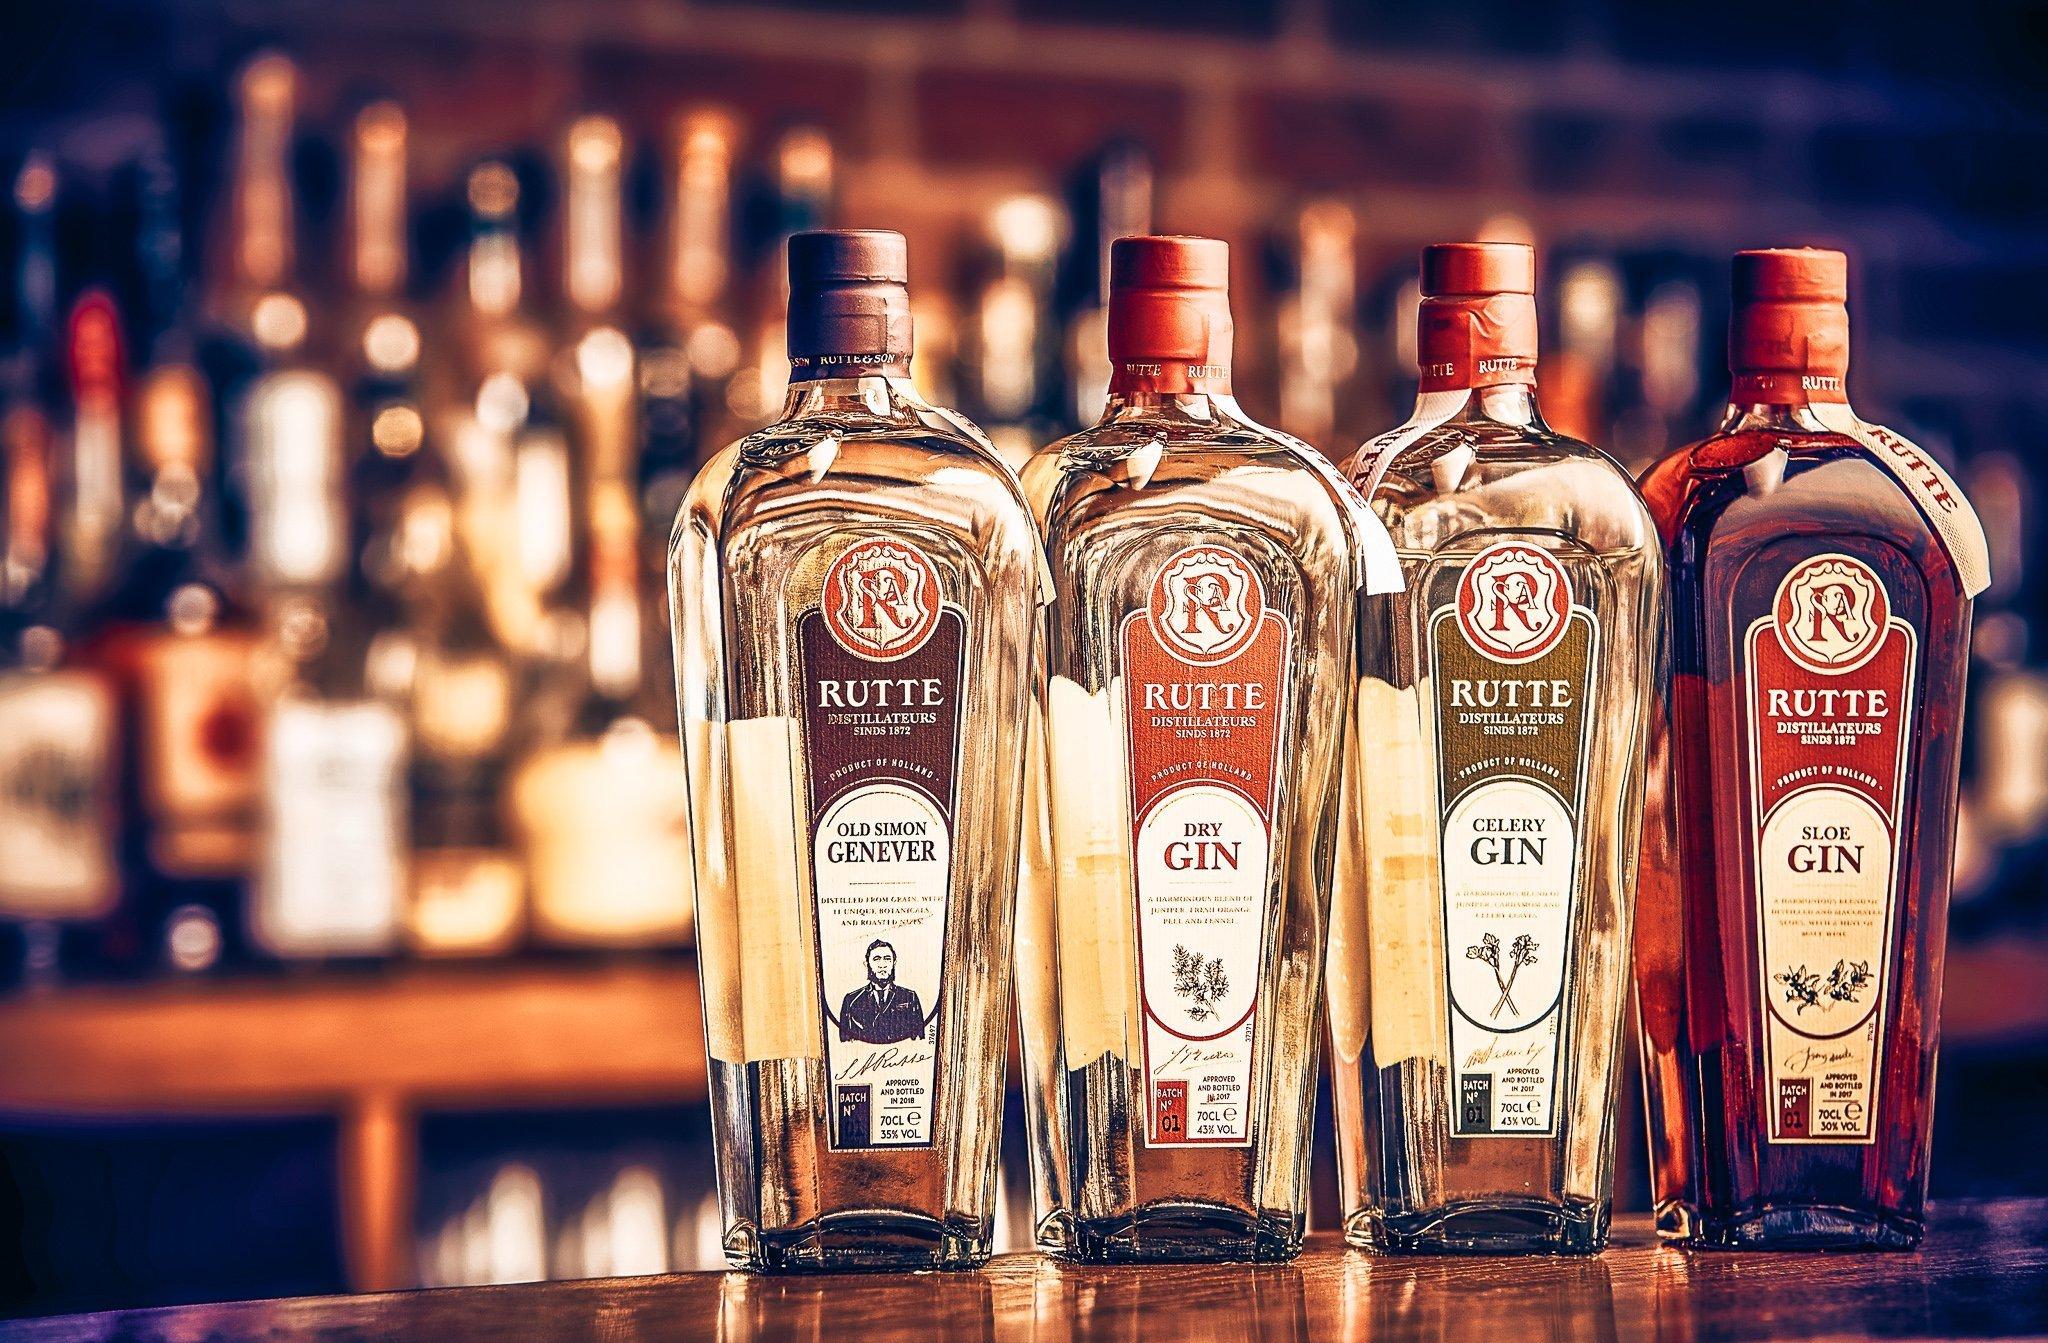 Rutte Gin range, Distilleerderij Rutte, Alles over gin.